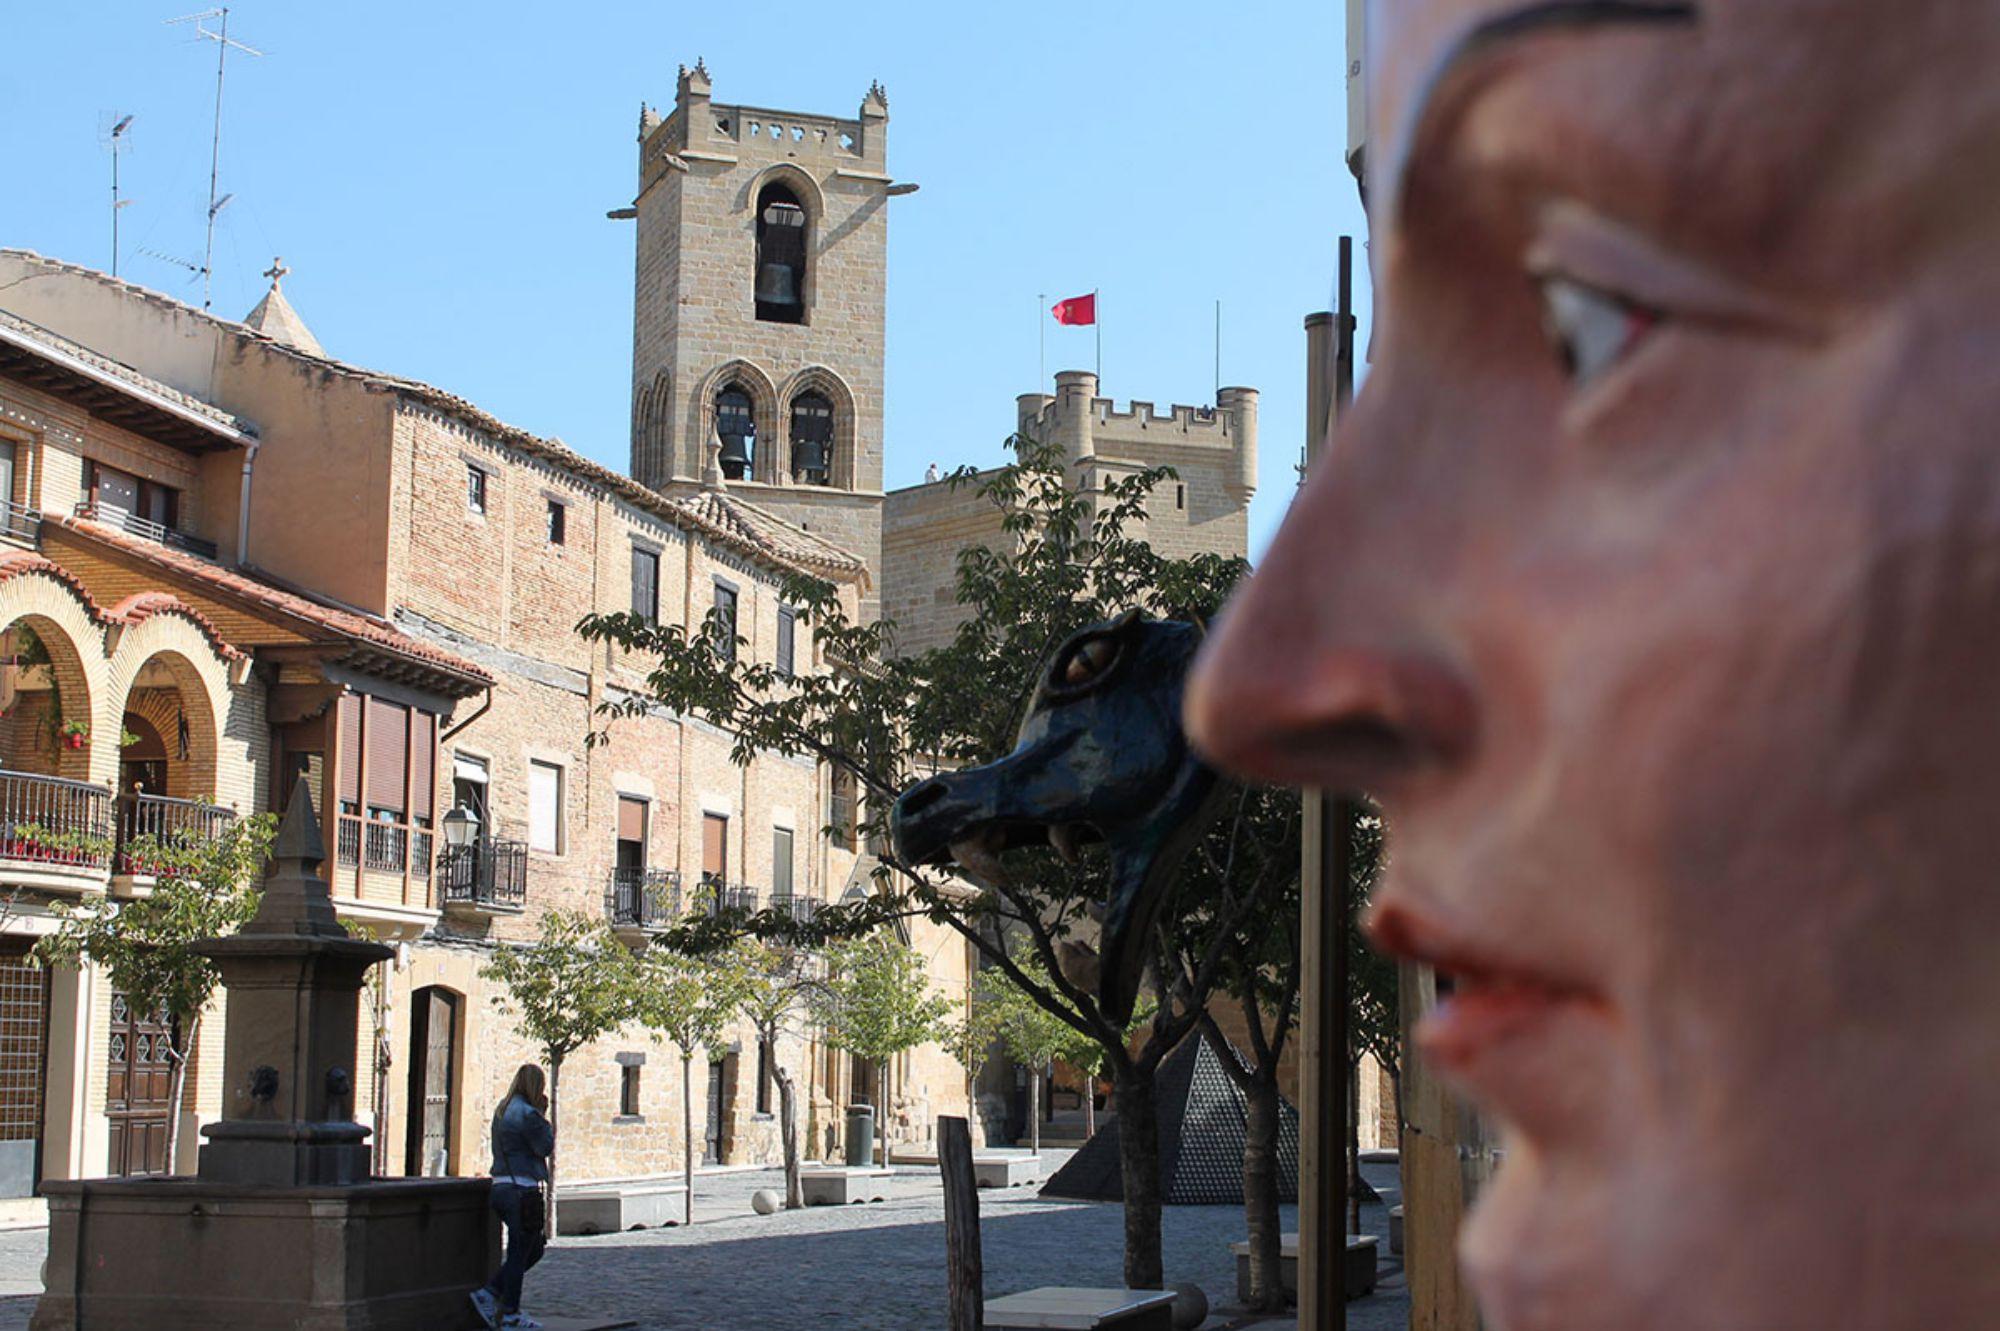 Una herbólera (una bruja local) observa la plaza de Olite, con el castillo al fondo. Foto: Edu Sánchez.